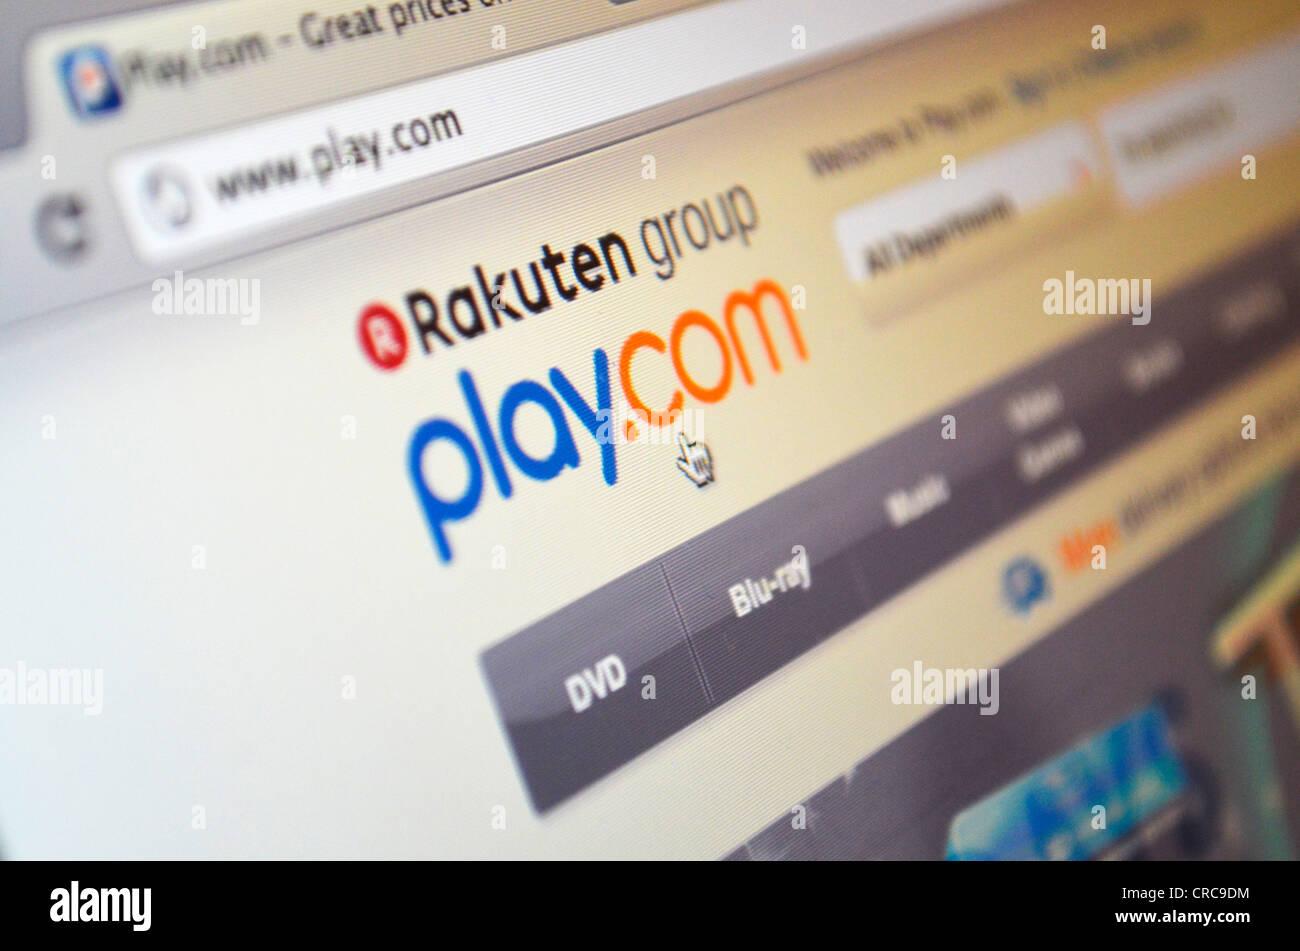 Play.com - Stock Image